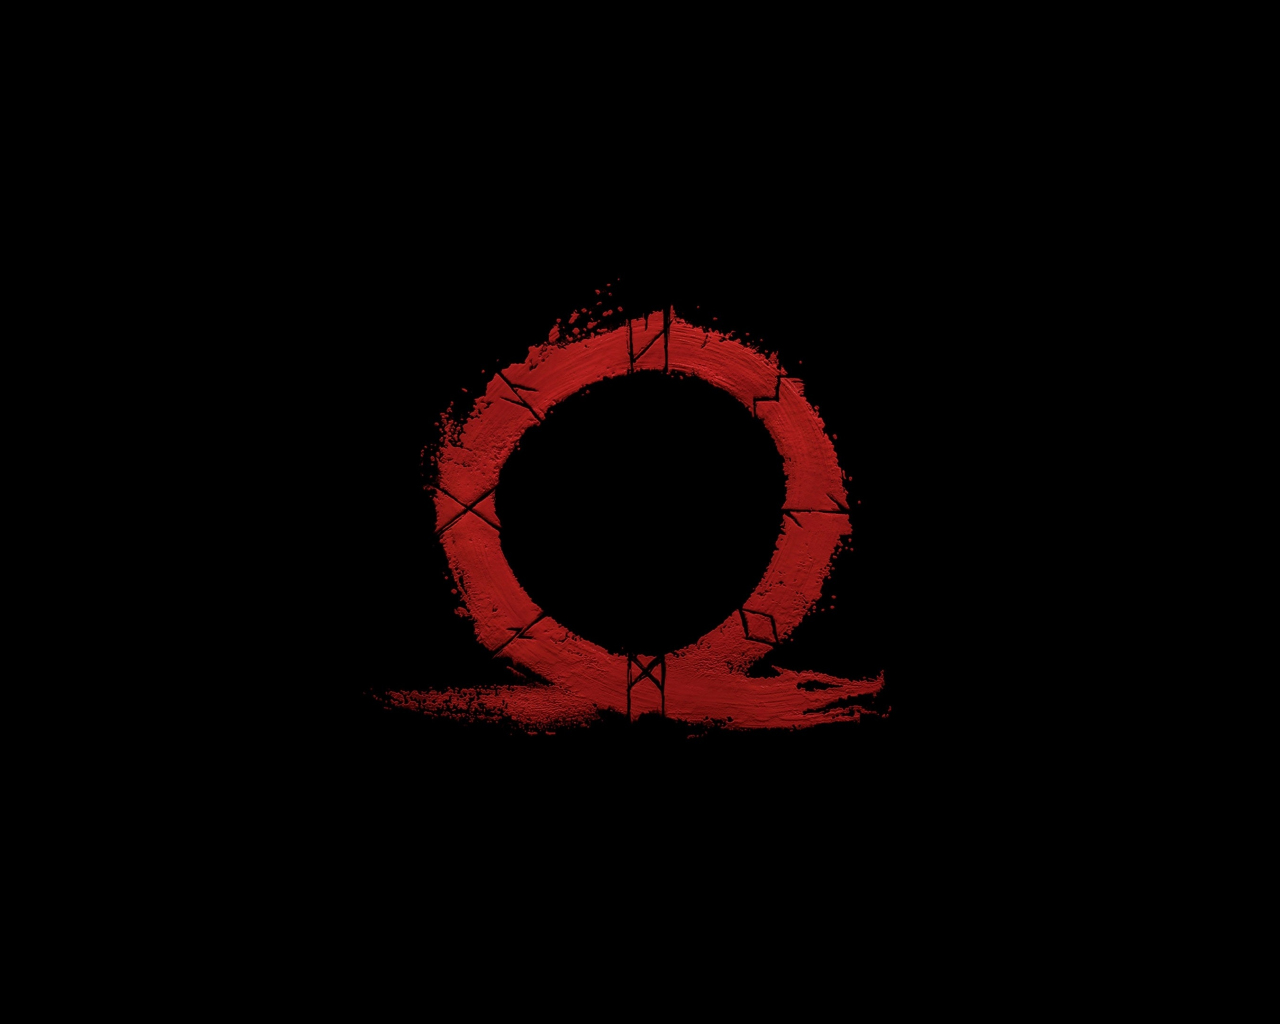 God Of War Omega Logo Video Game Minimal 1280x1024 Wallpaper